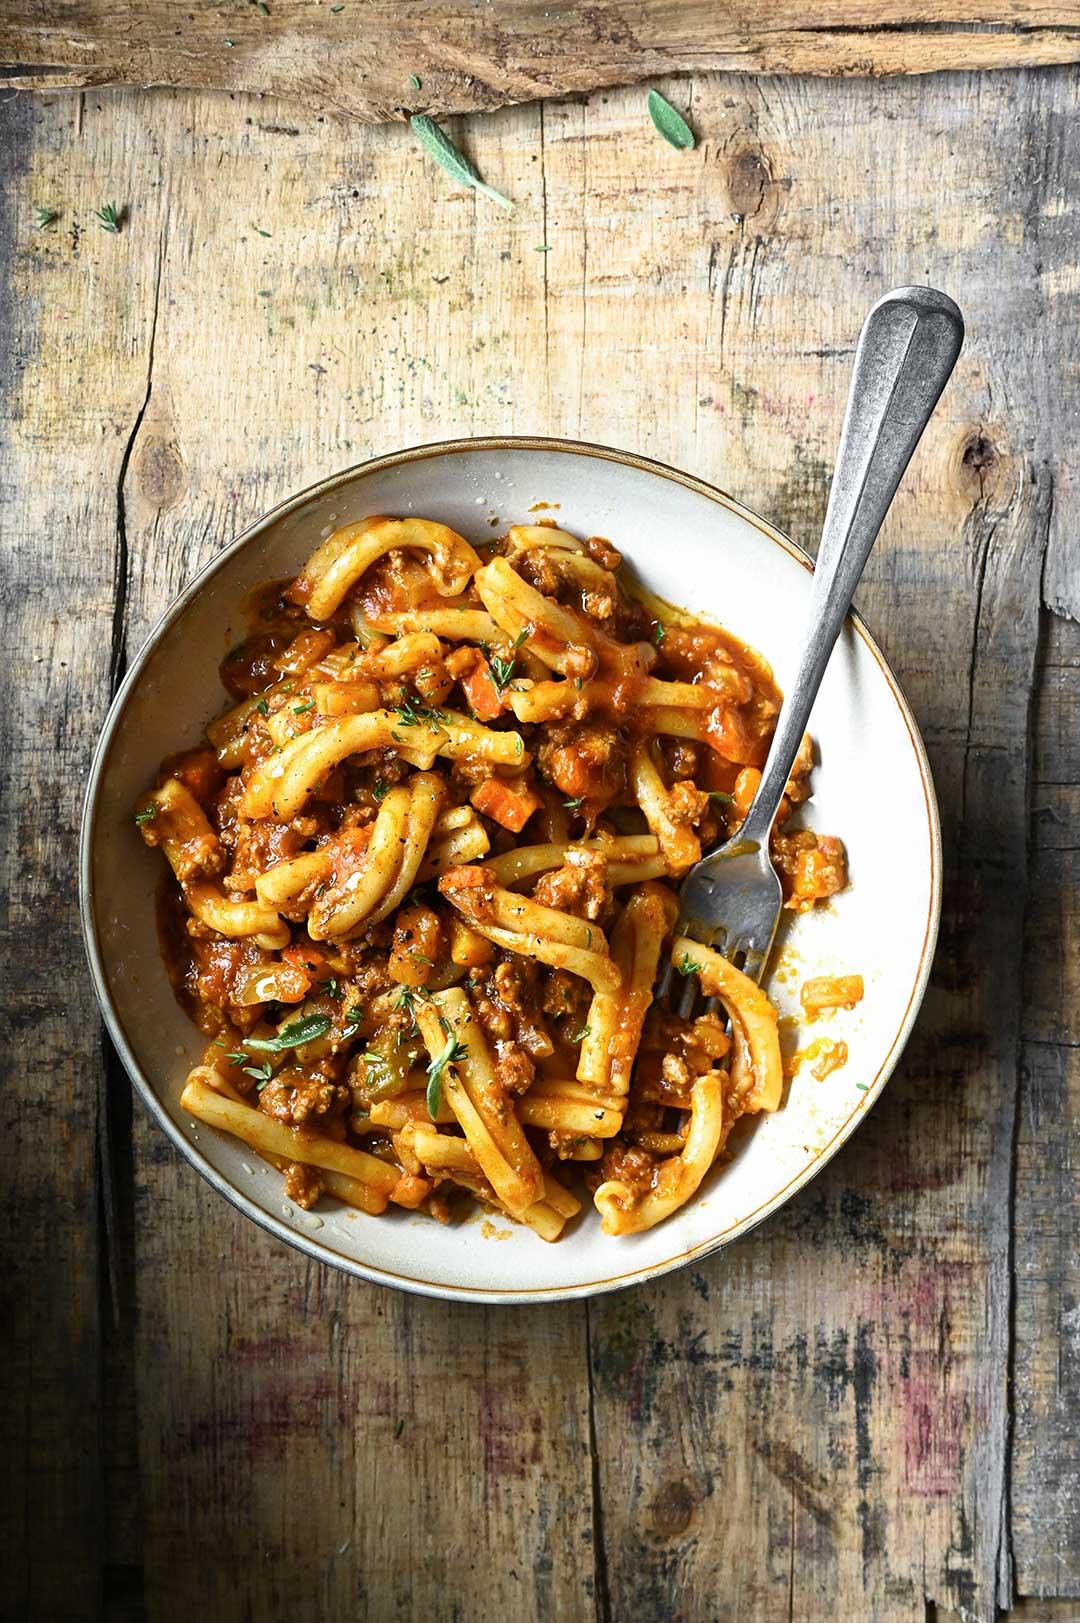 serving dumplings | Sos bolognese z mięsem wołowym i dynią